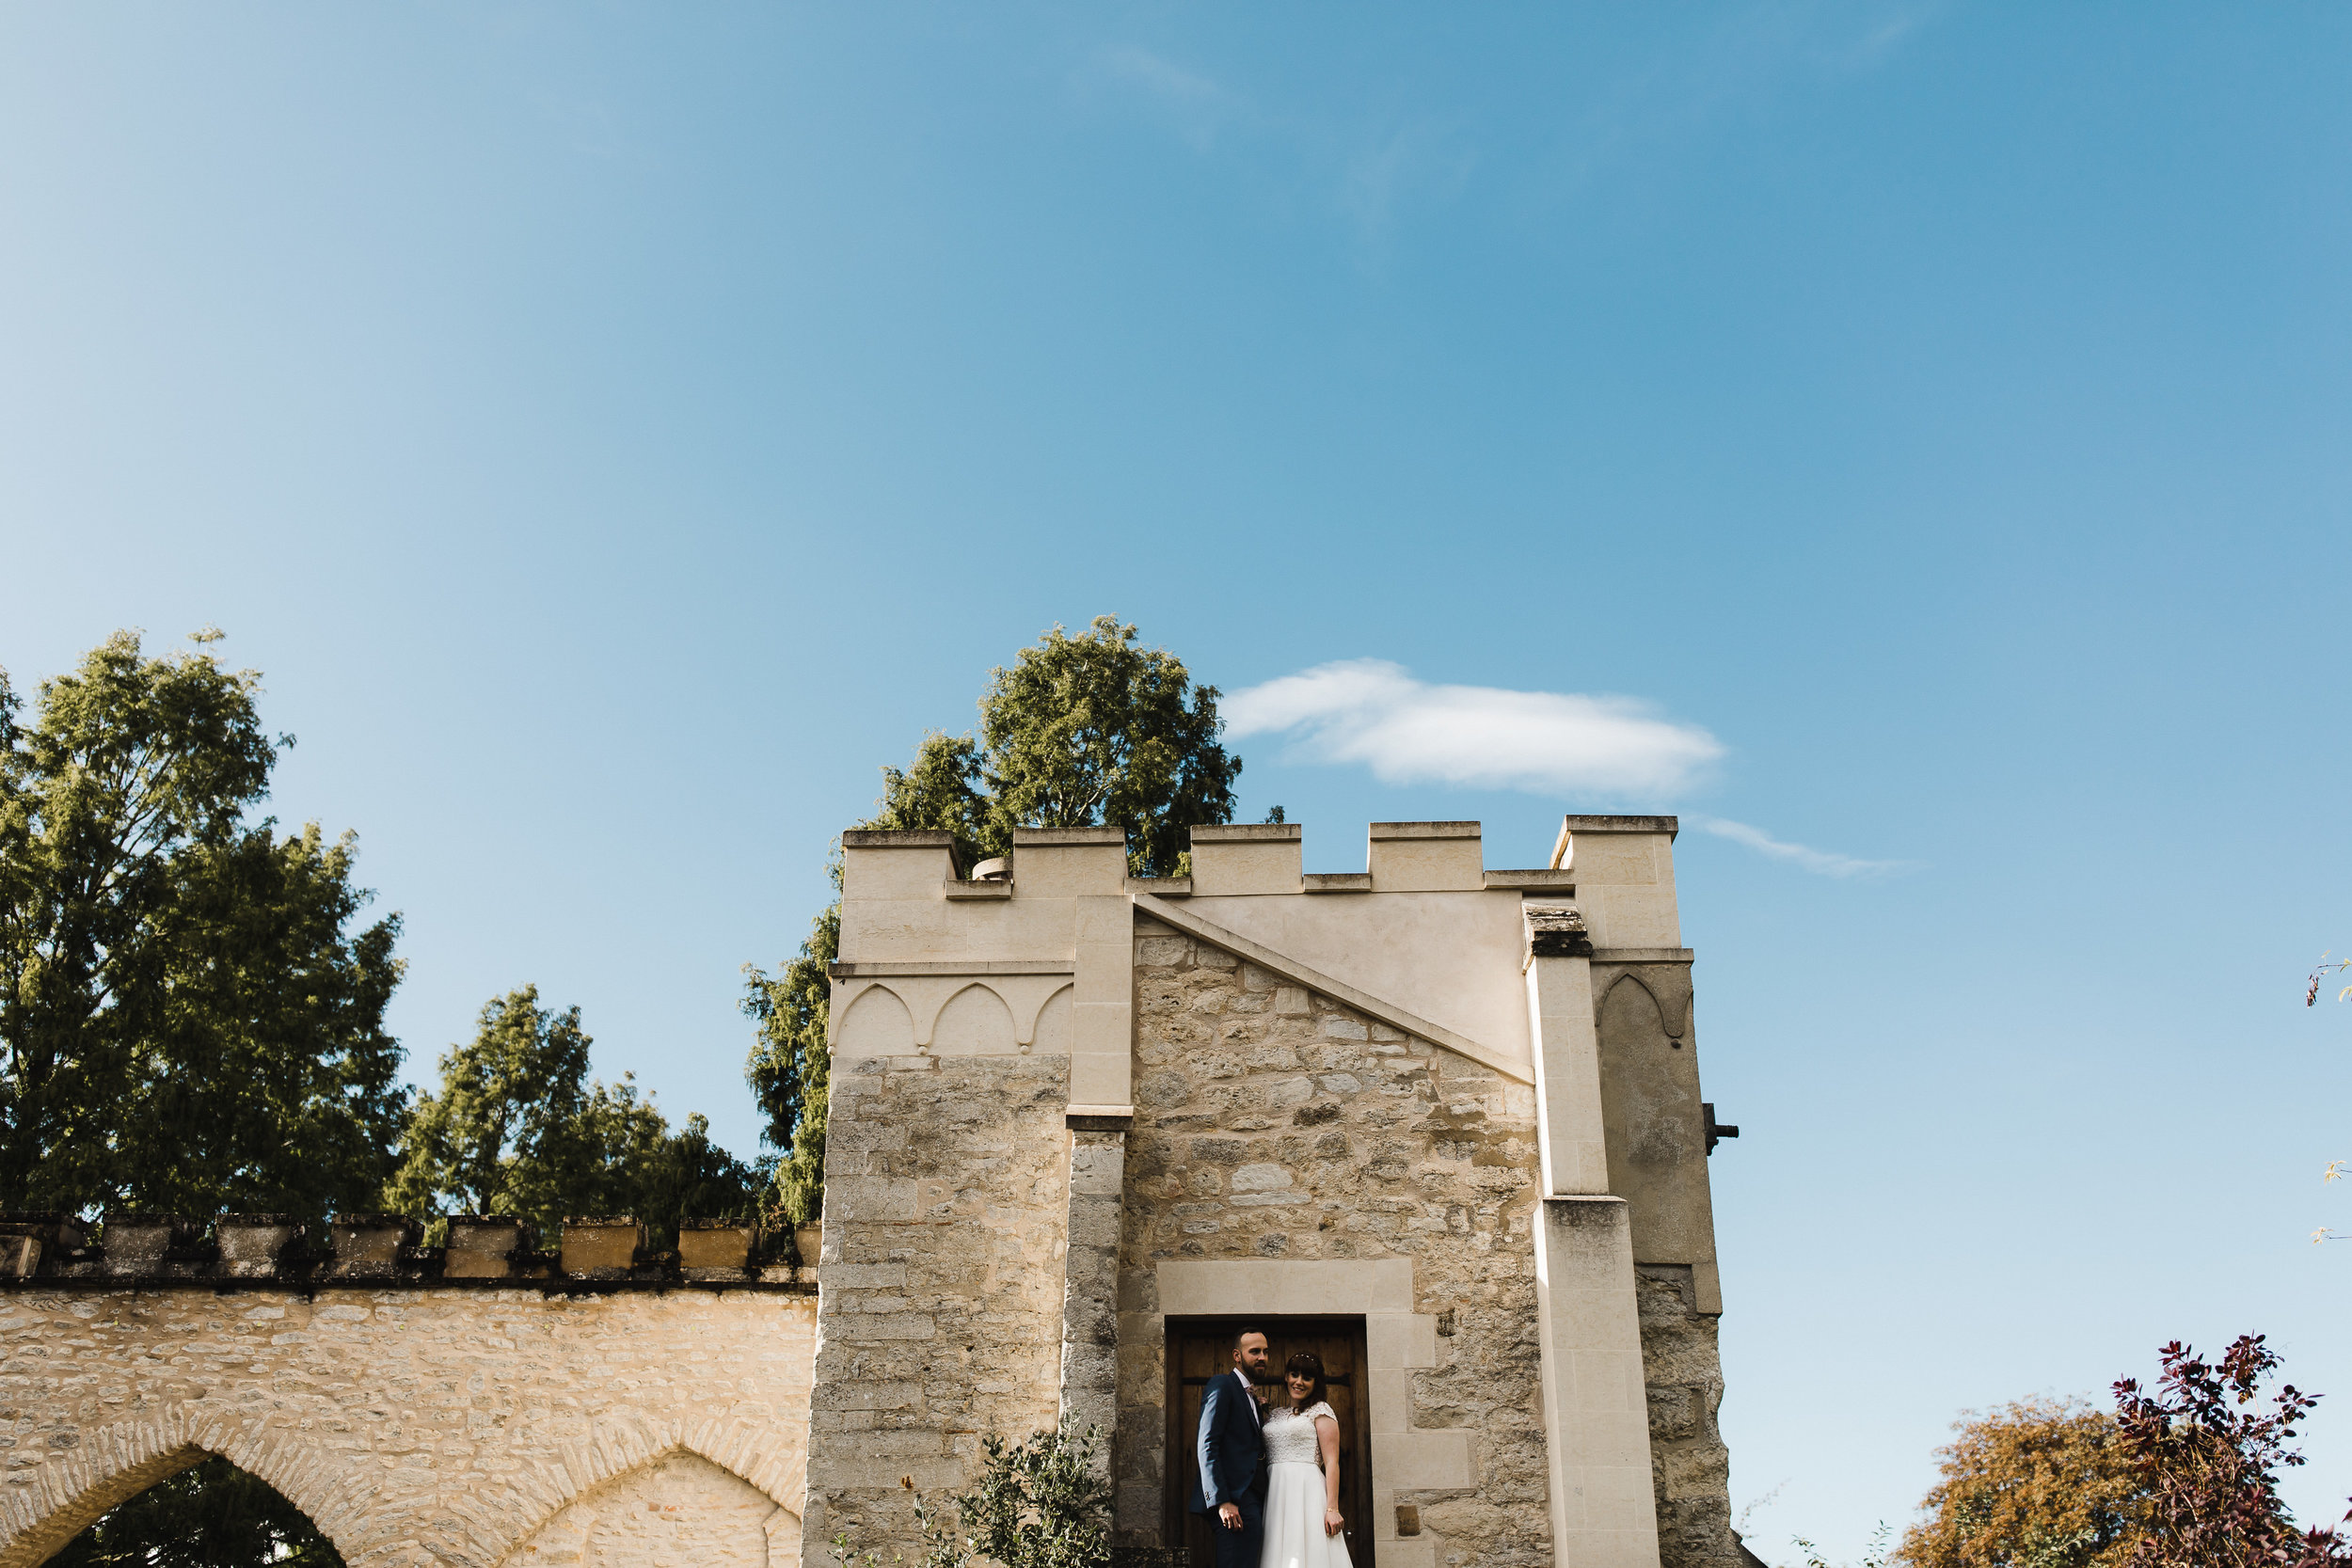 Nether_Wichendon_House_Wedding_067.jpg